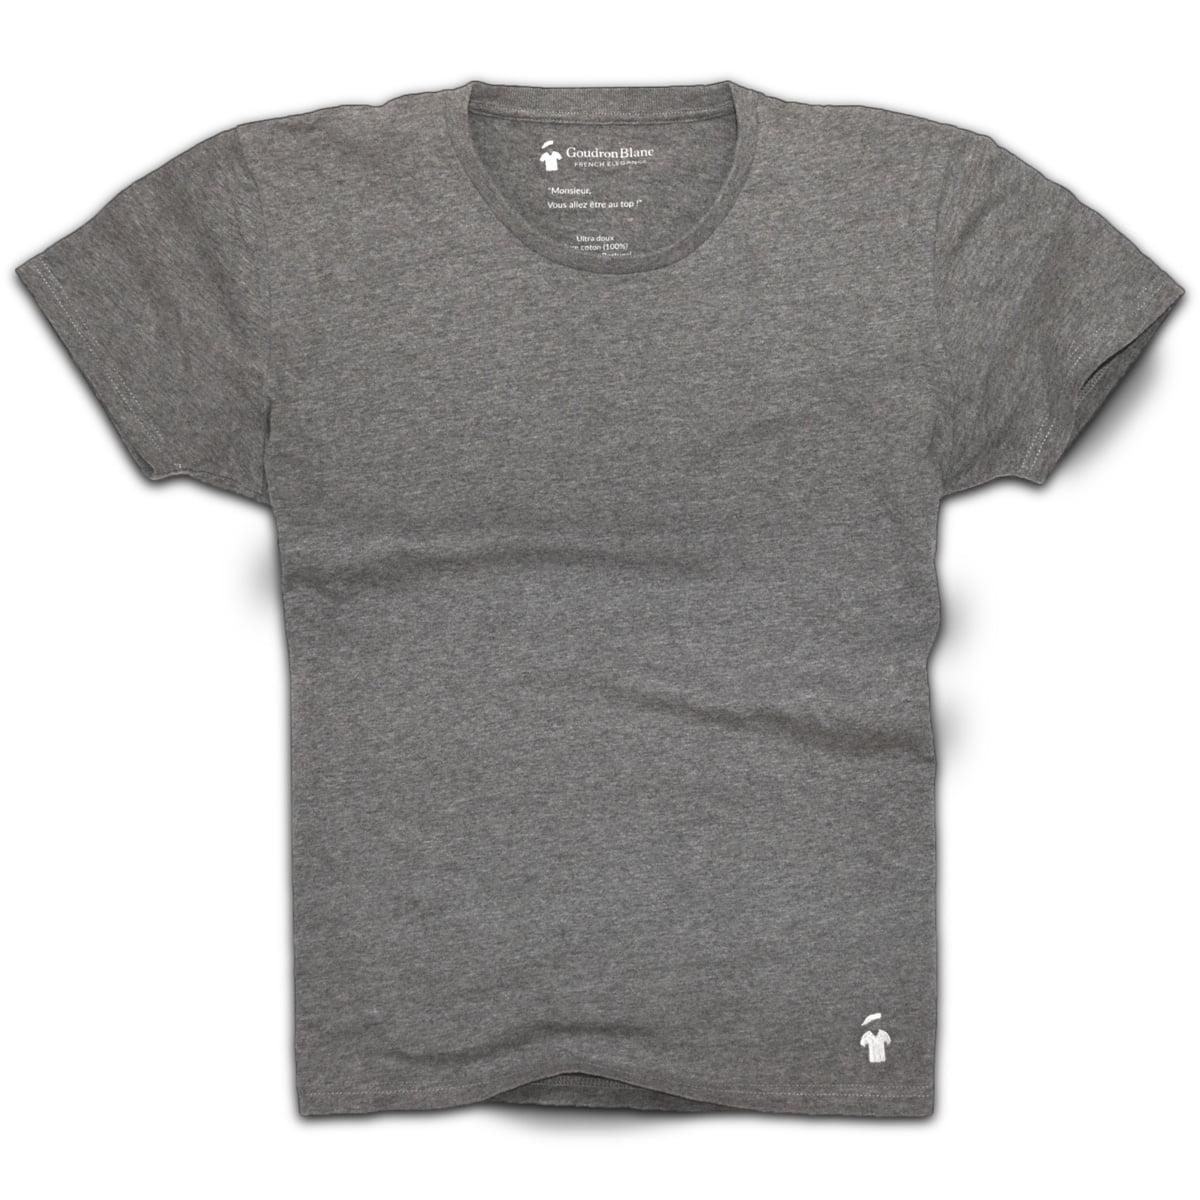 Tshirt Col Rond Homme T-shirt Gris Coton shirt Homme Tshirt